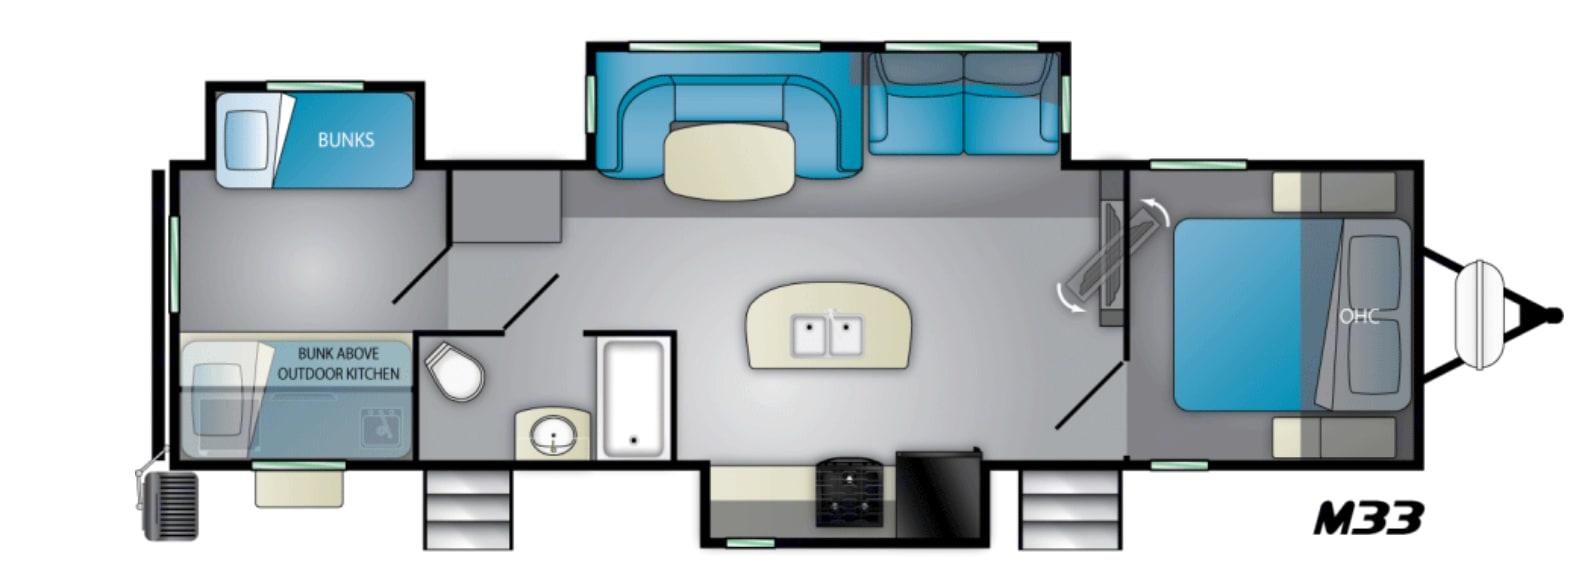 Floorplan. Heartland Mallard M33 2021